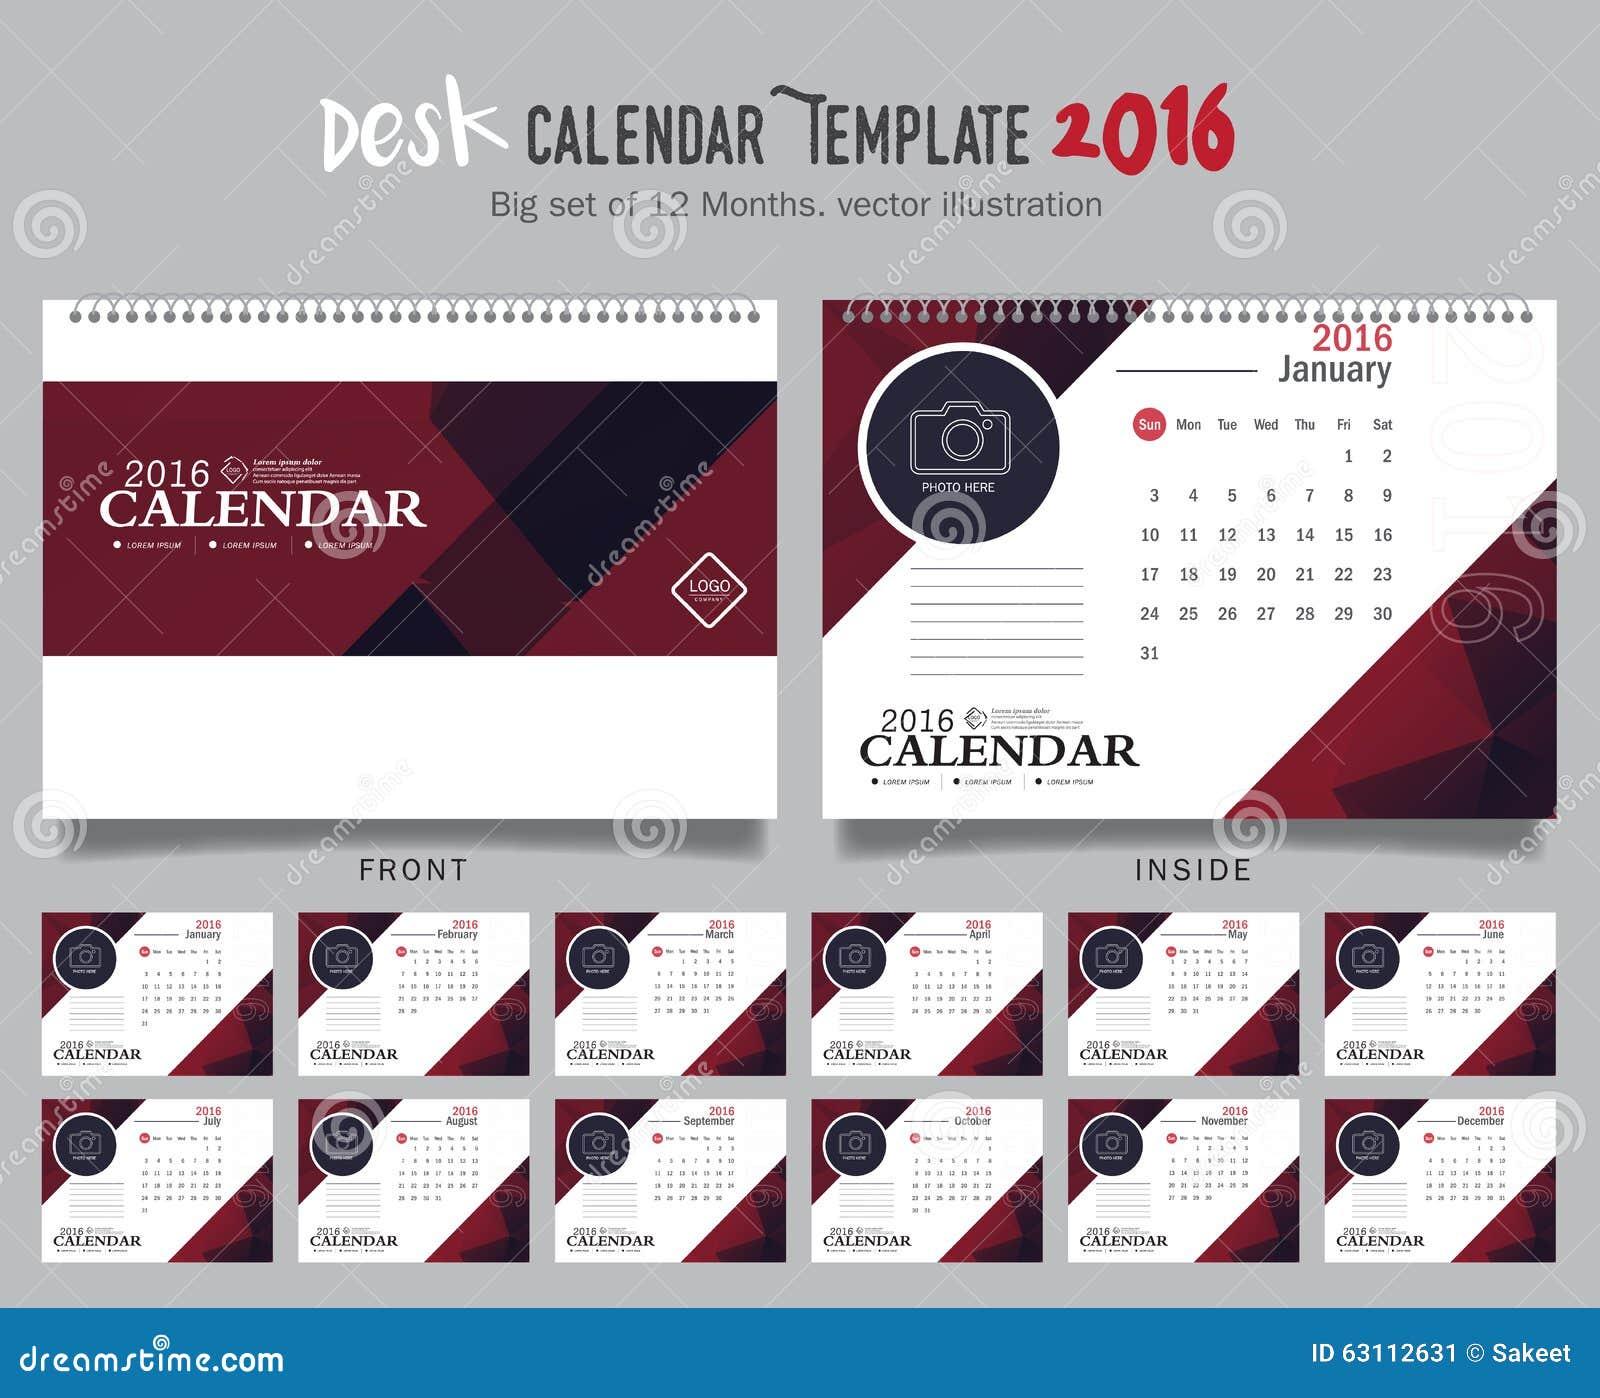 Table Calendar Design Samples : Desk calendar vector design template big set of